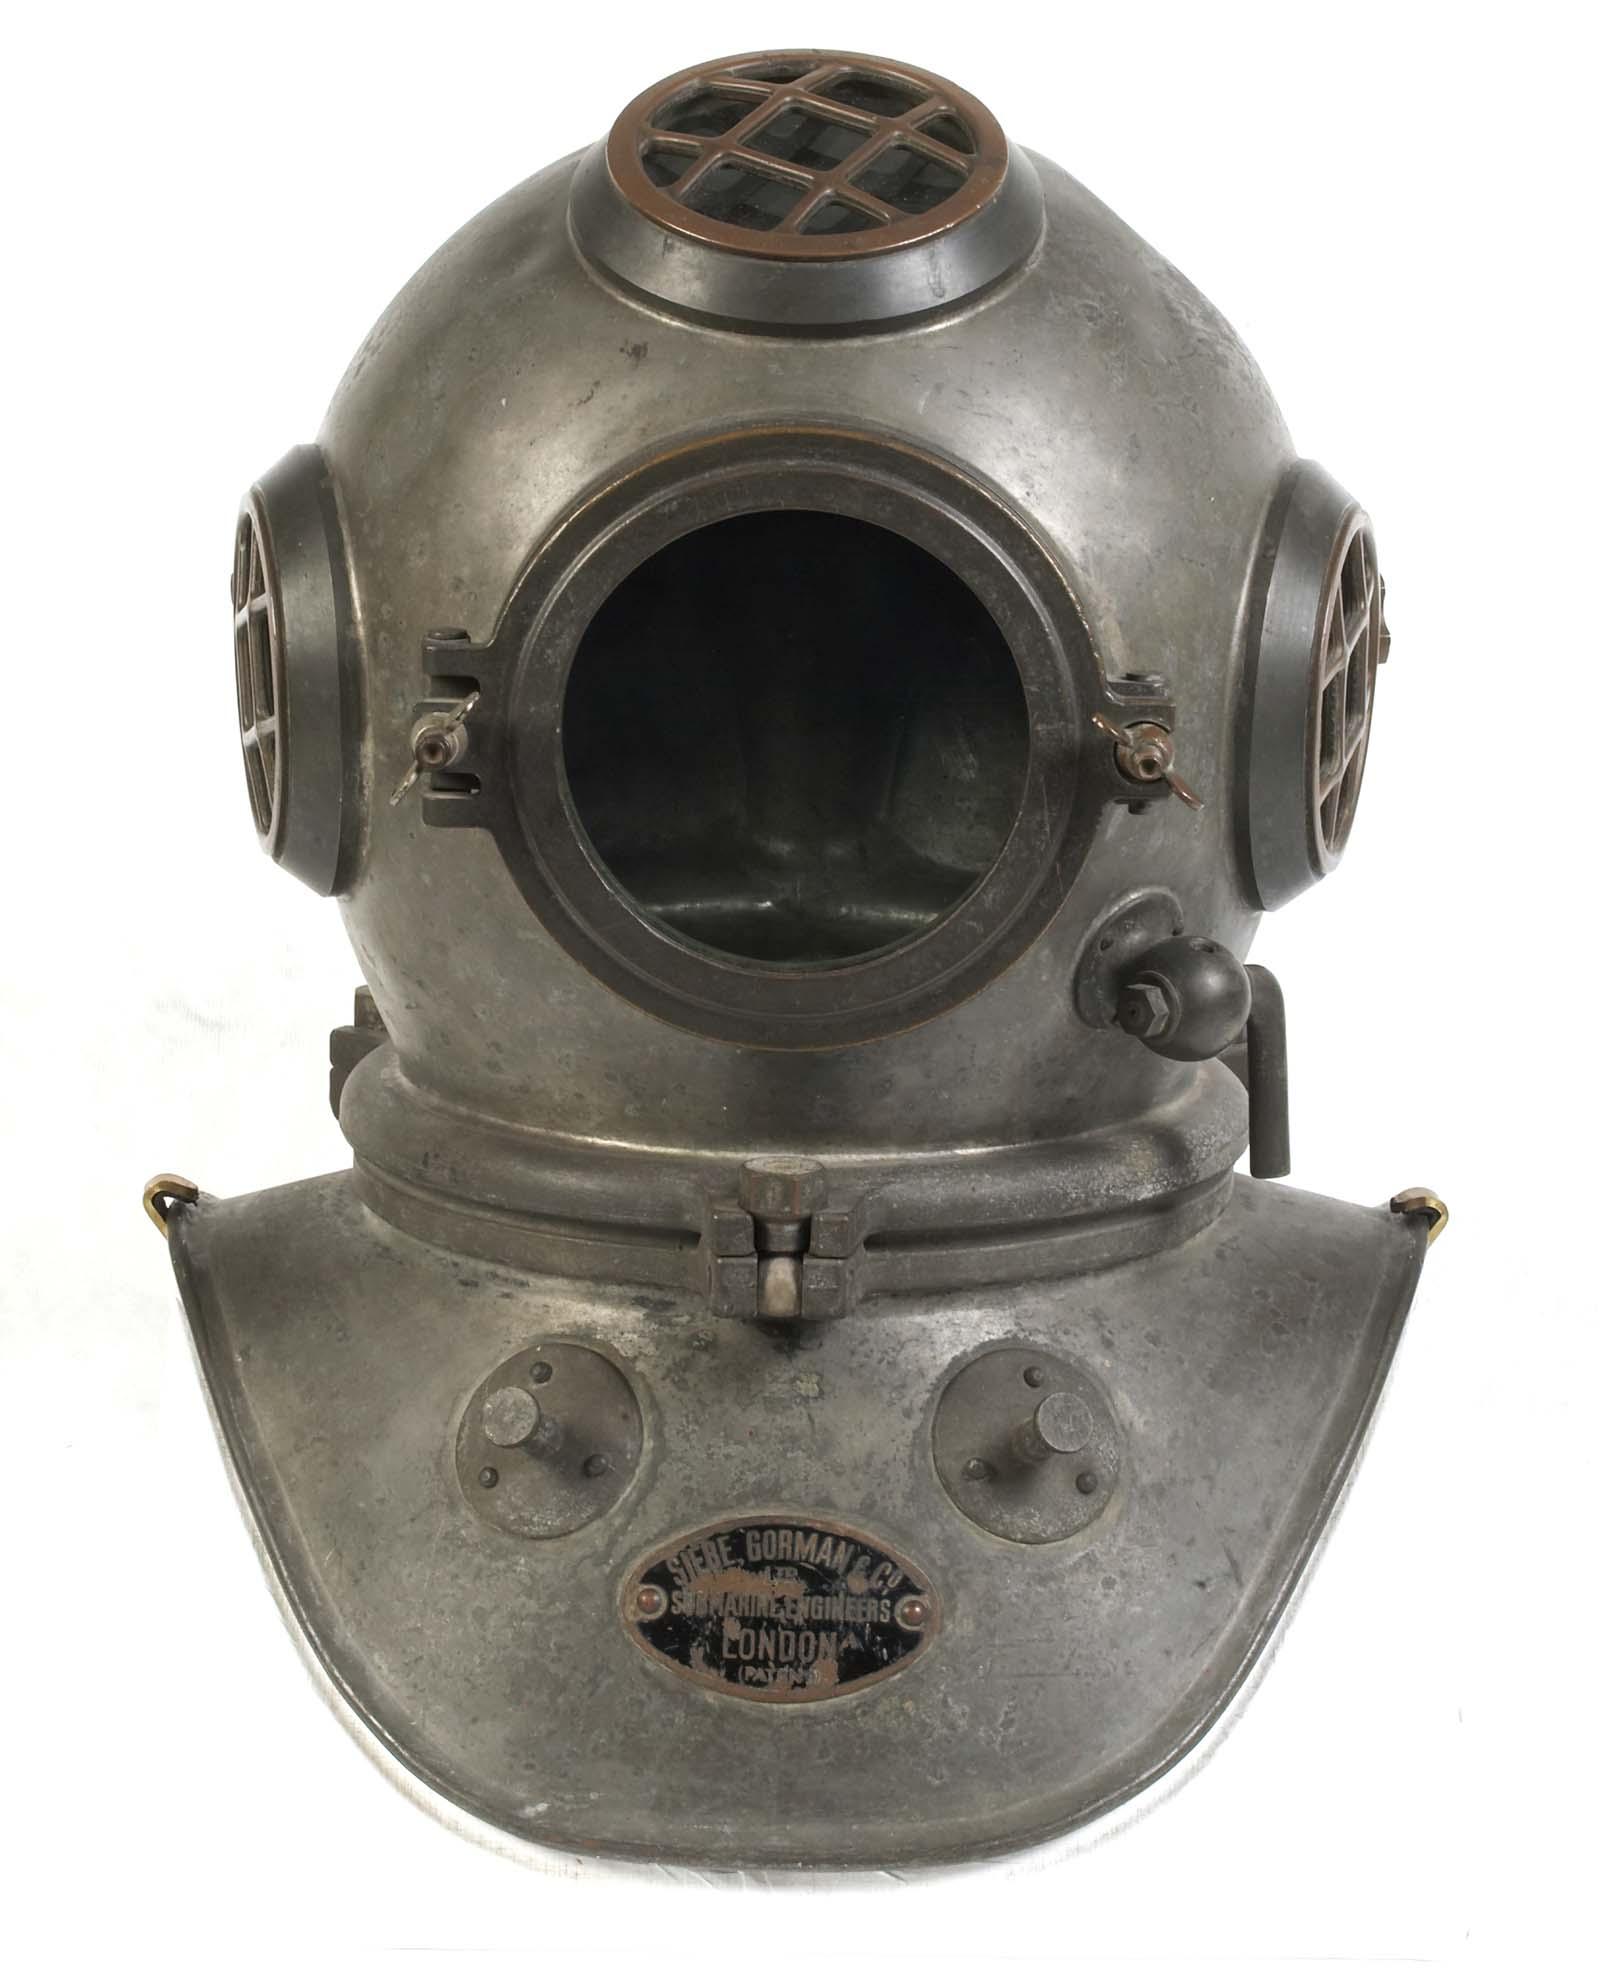 photo of a divers helmet